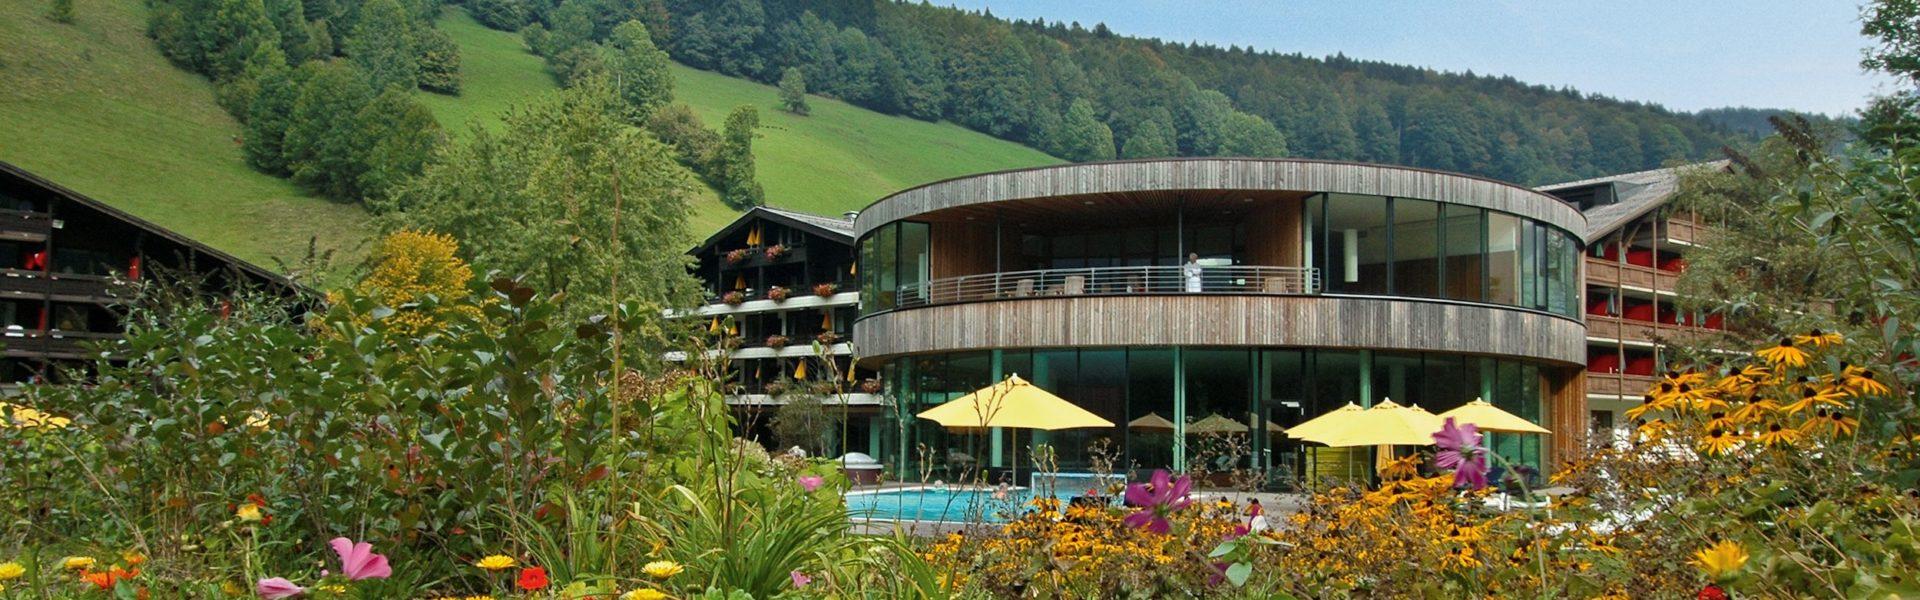 Wellnesshotel Vorarlberg Gesundhotel Bad Reuthe